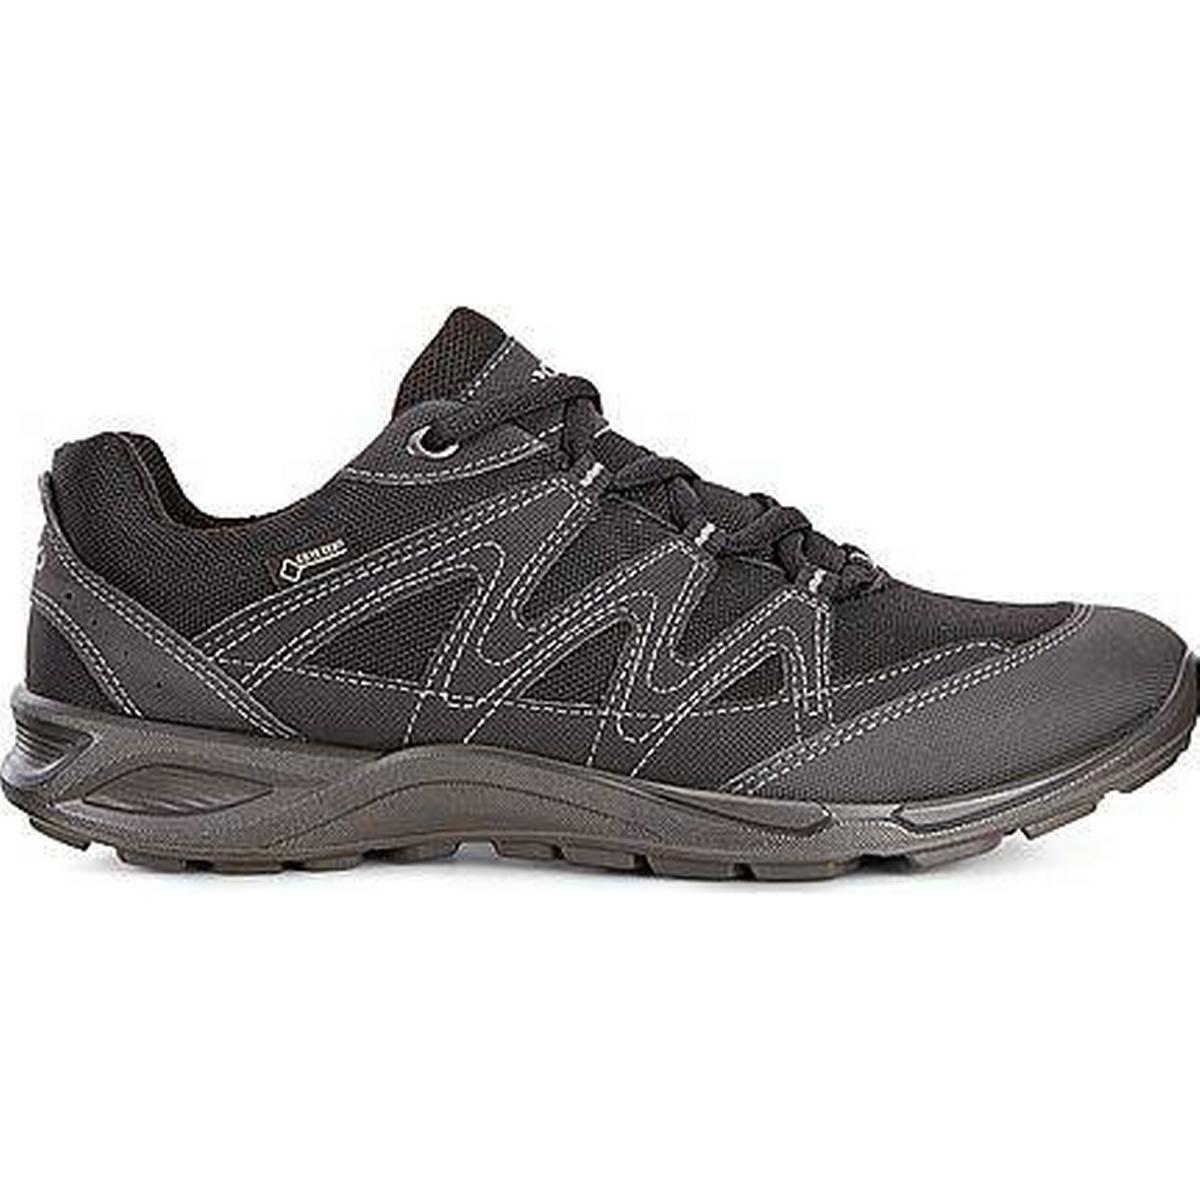 Gå sko 38 Sammenlign priser hos PriceRunner